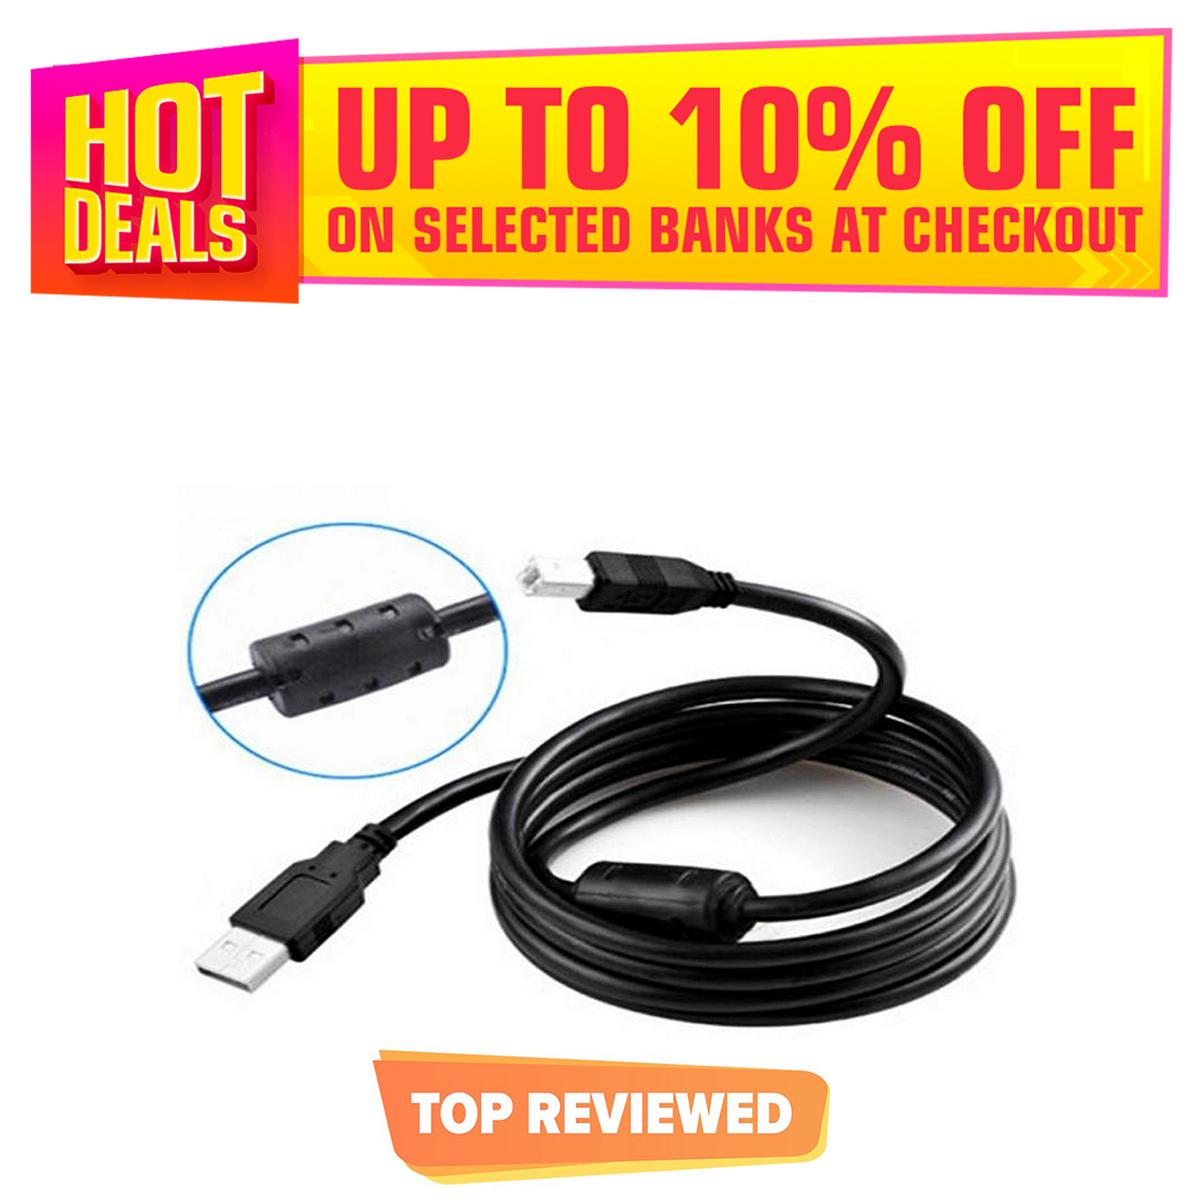 USB Printer Cable - Black - 1.5M